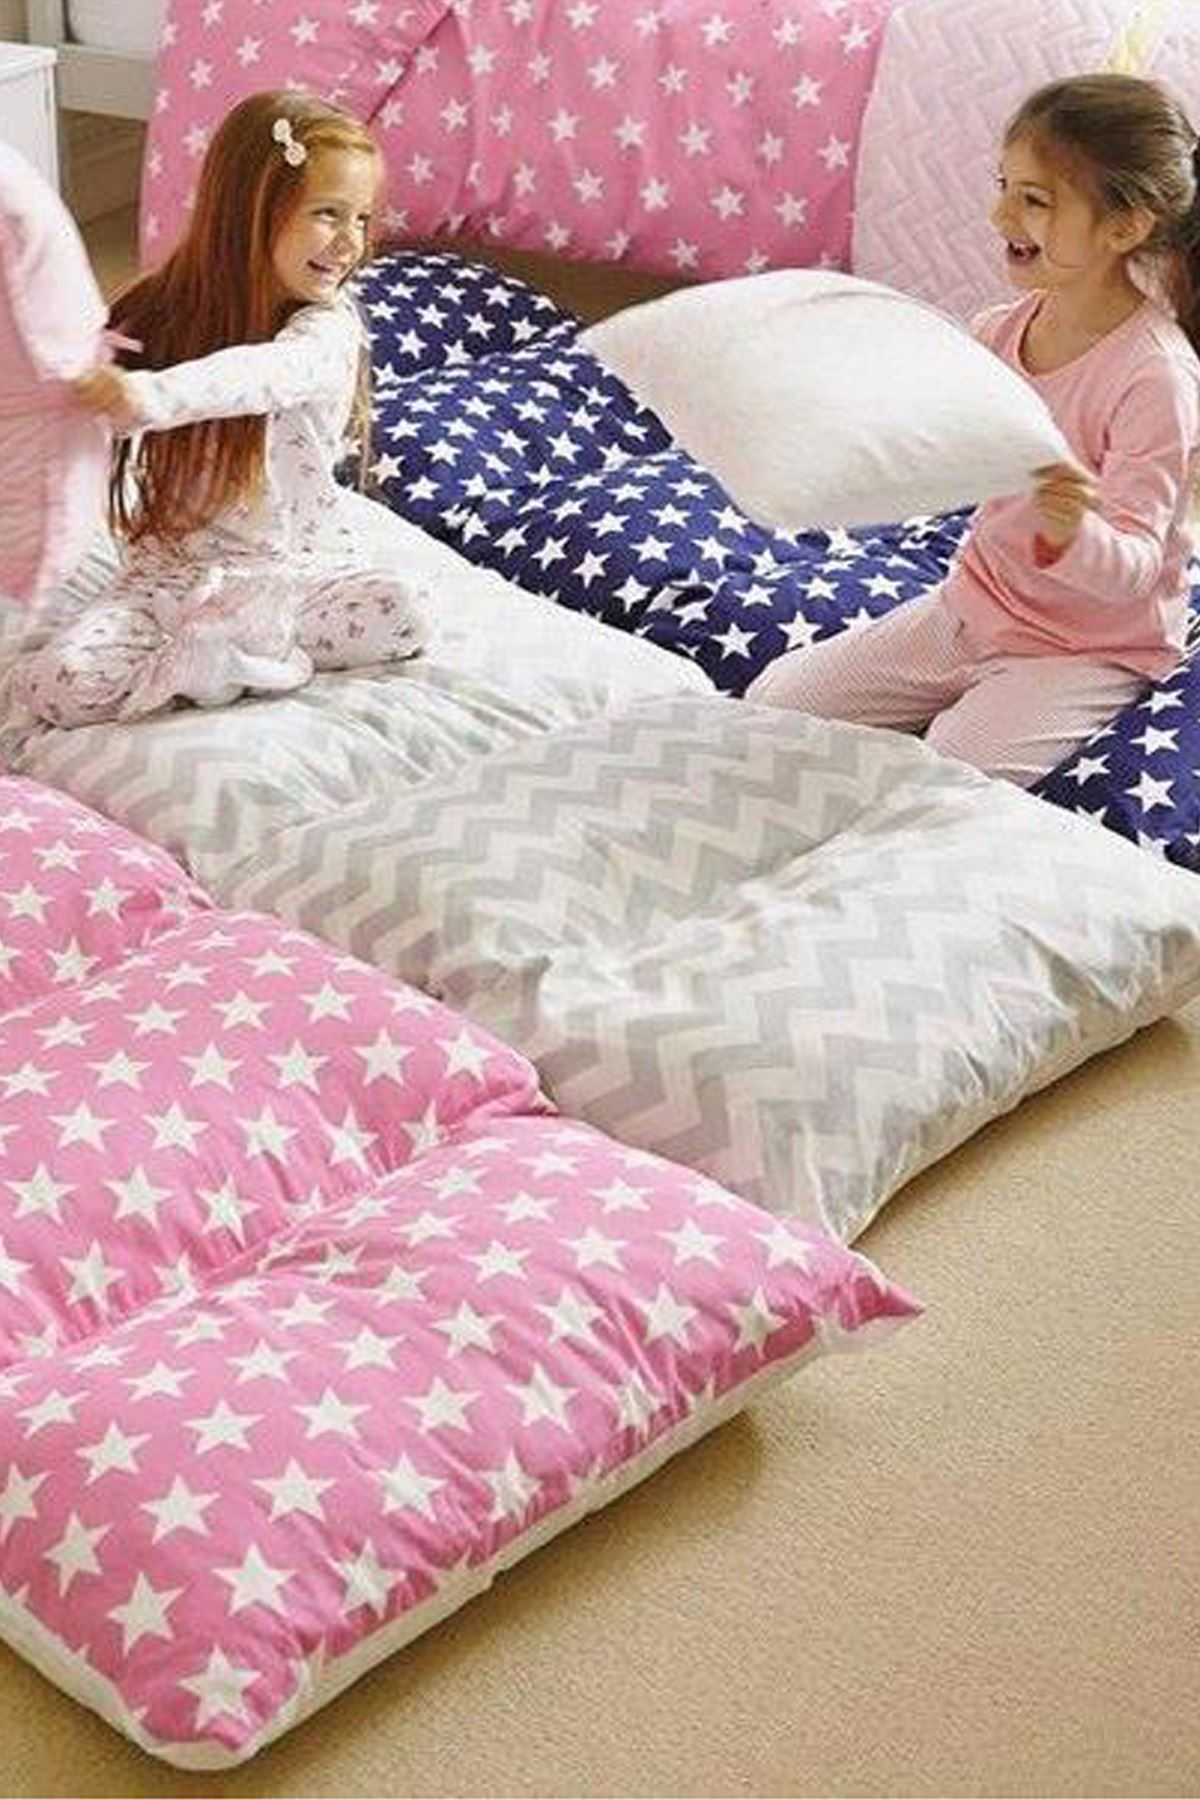 Blue Bundera Pouf Foldable Floor Cushion Pillow Kids Baby Floor Bed